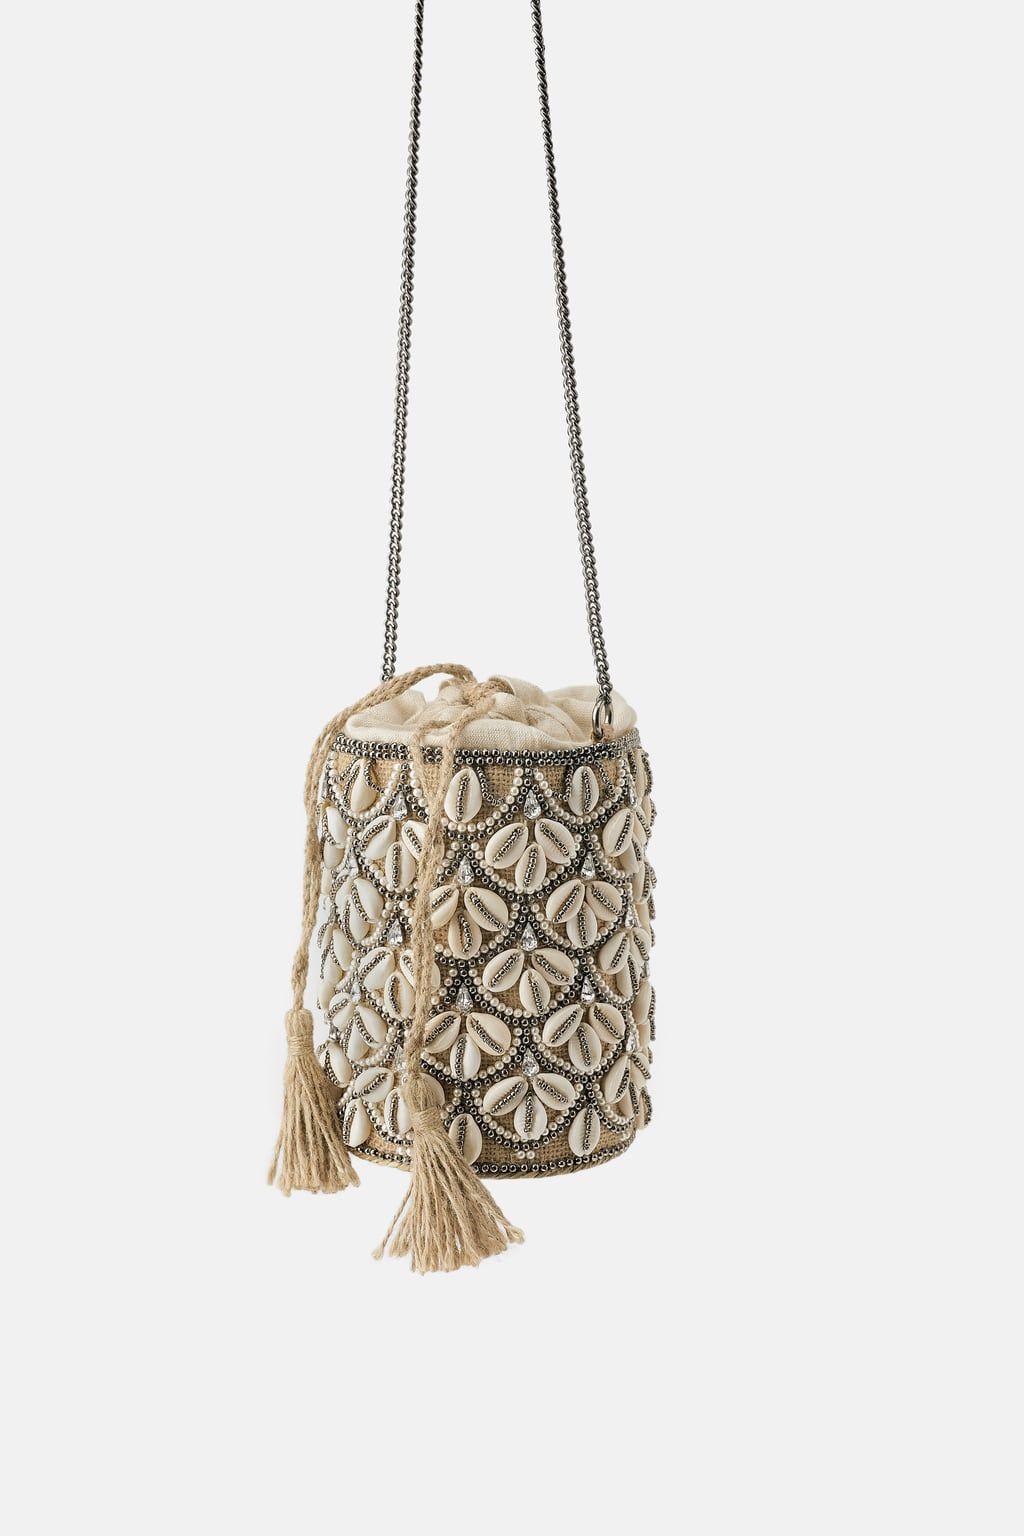 f03f21e1e Seashell crossbody basket bag in 2019 | To buy | Basket bag, Bags ...